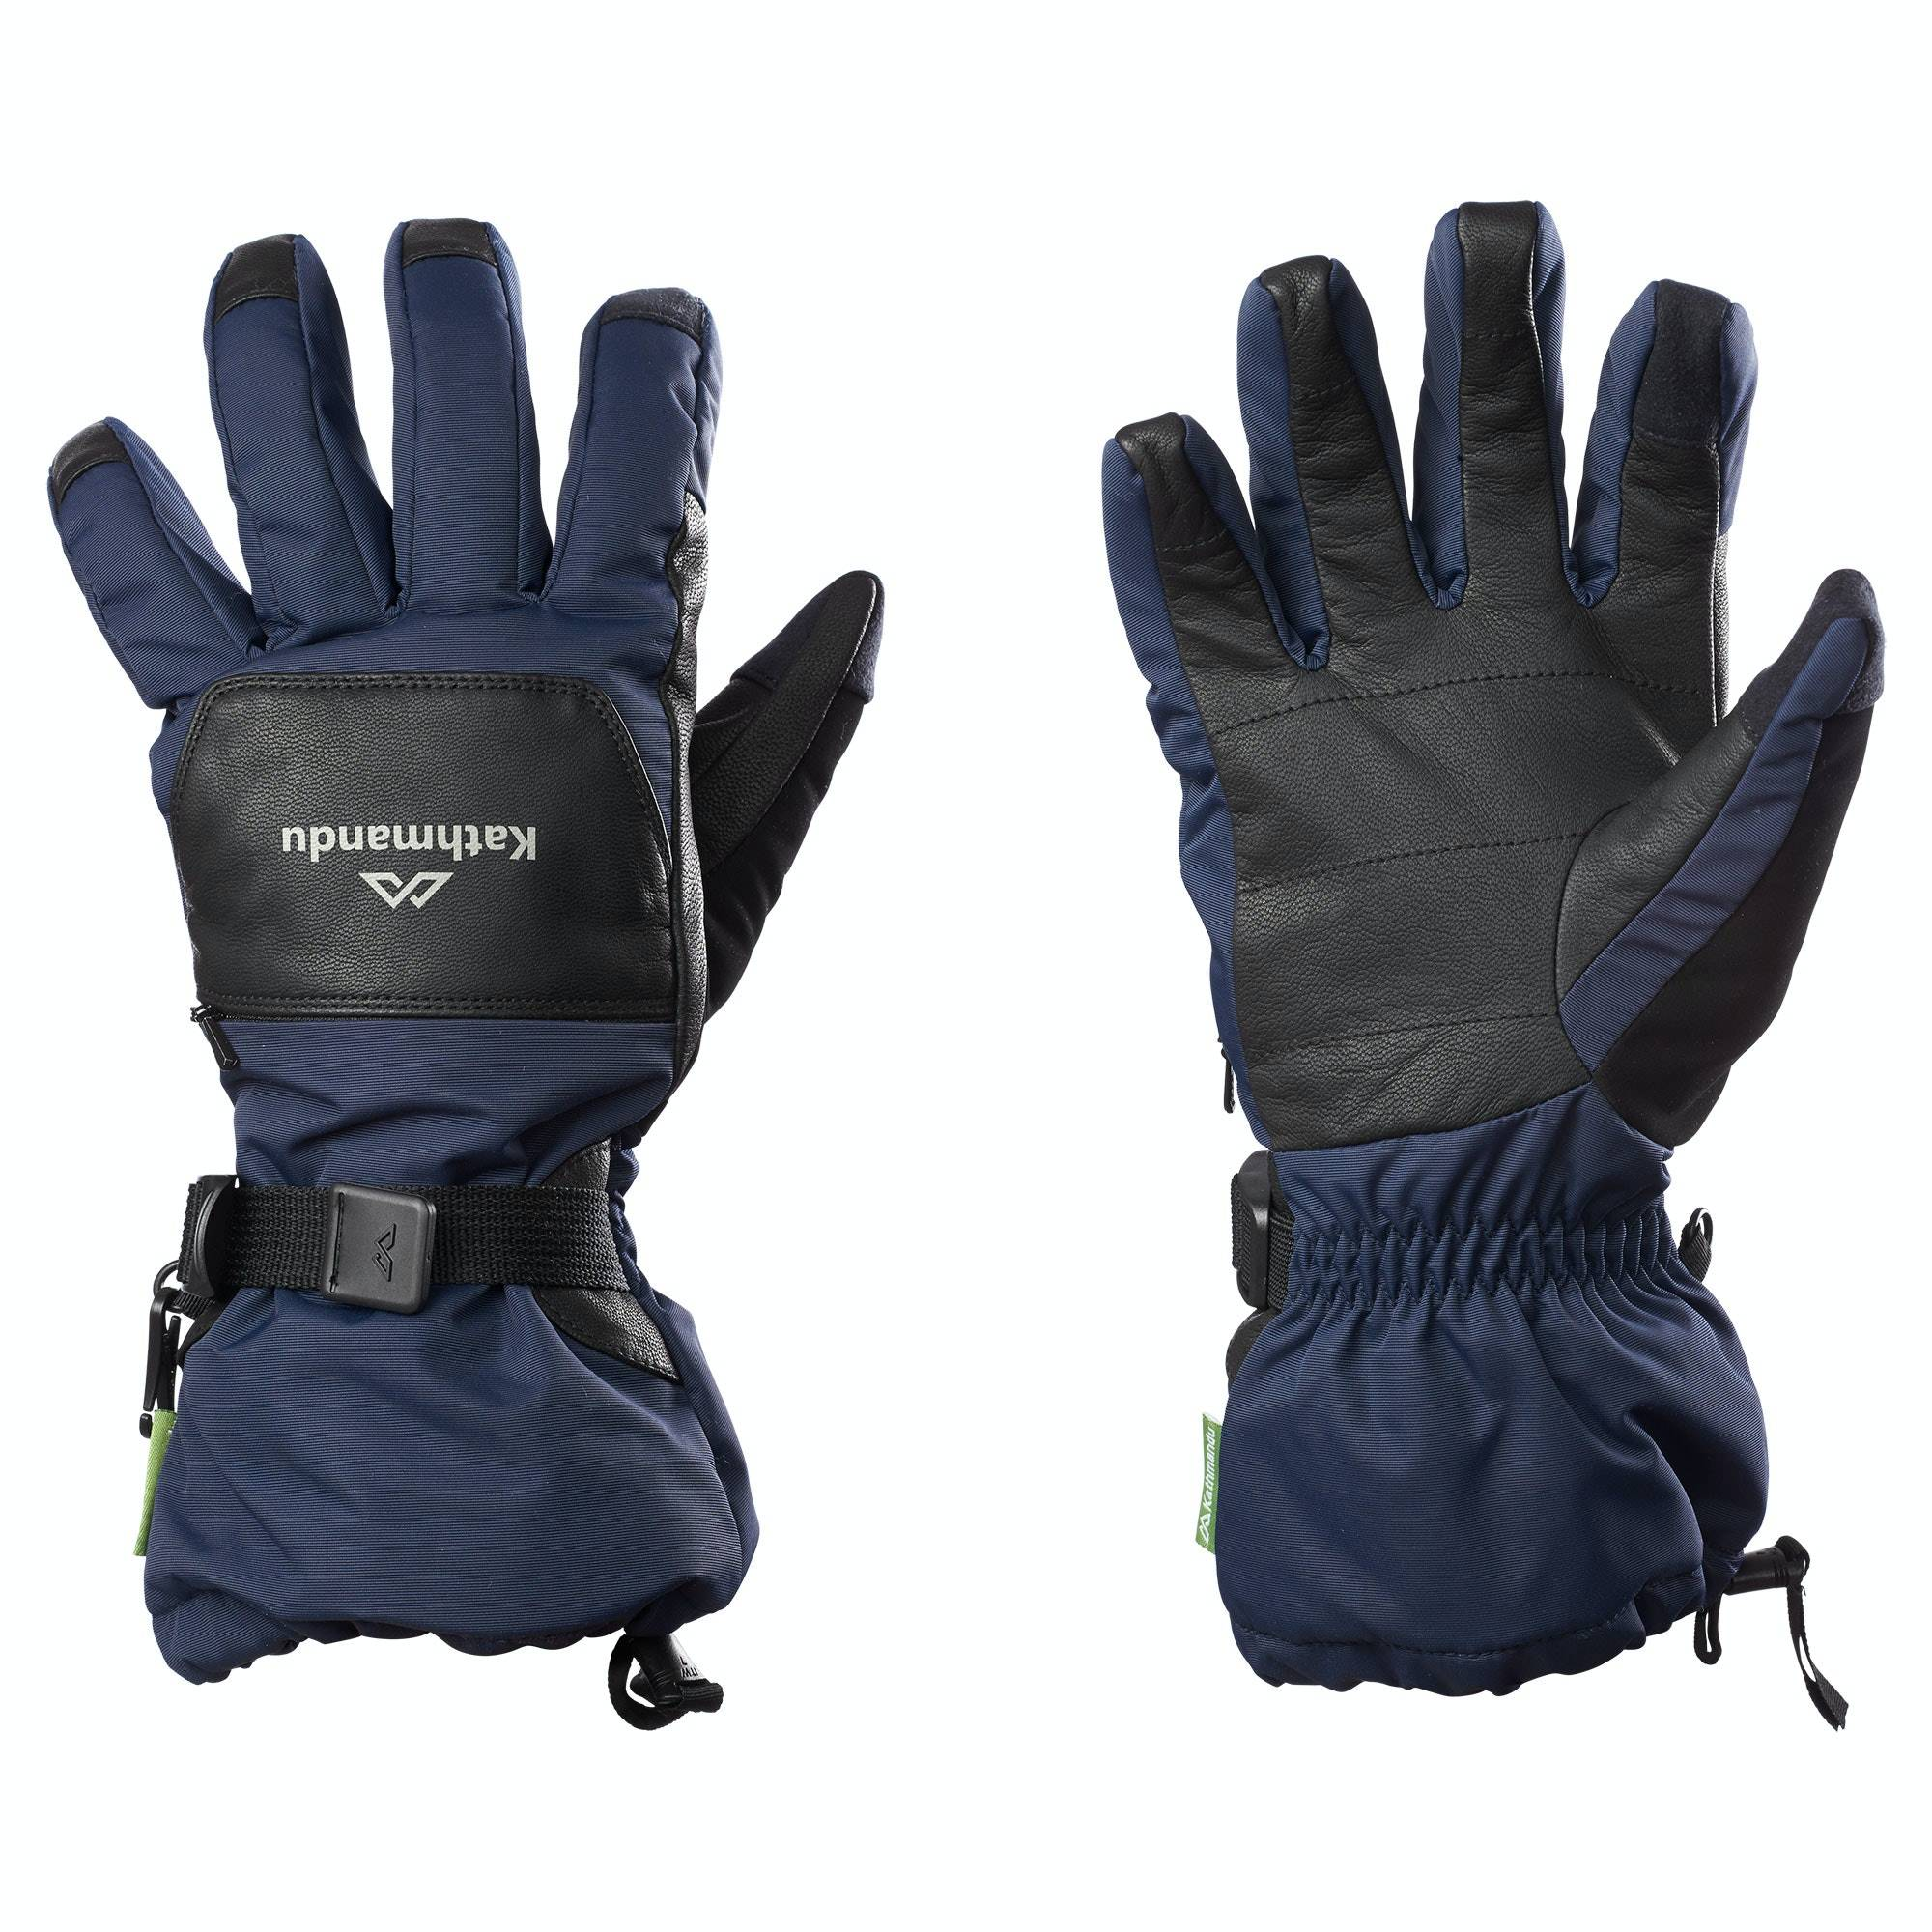 Kathmandu Snow Sports Gloves  - Dark Navy - Size: Extra Large